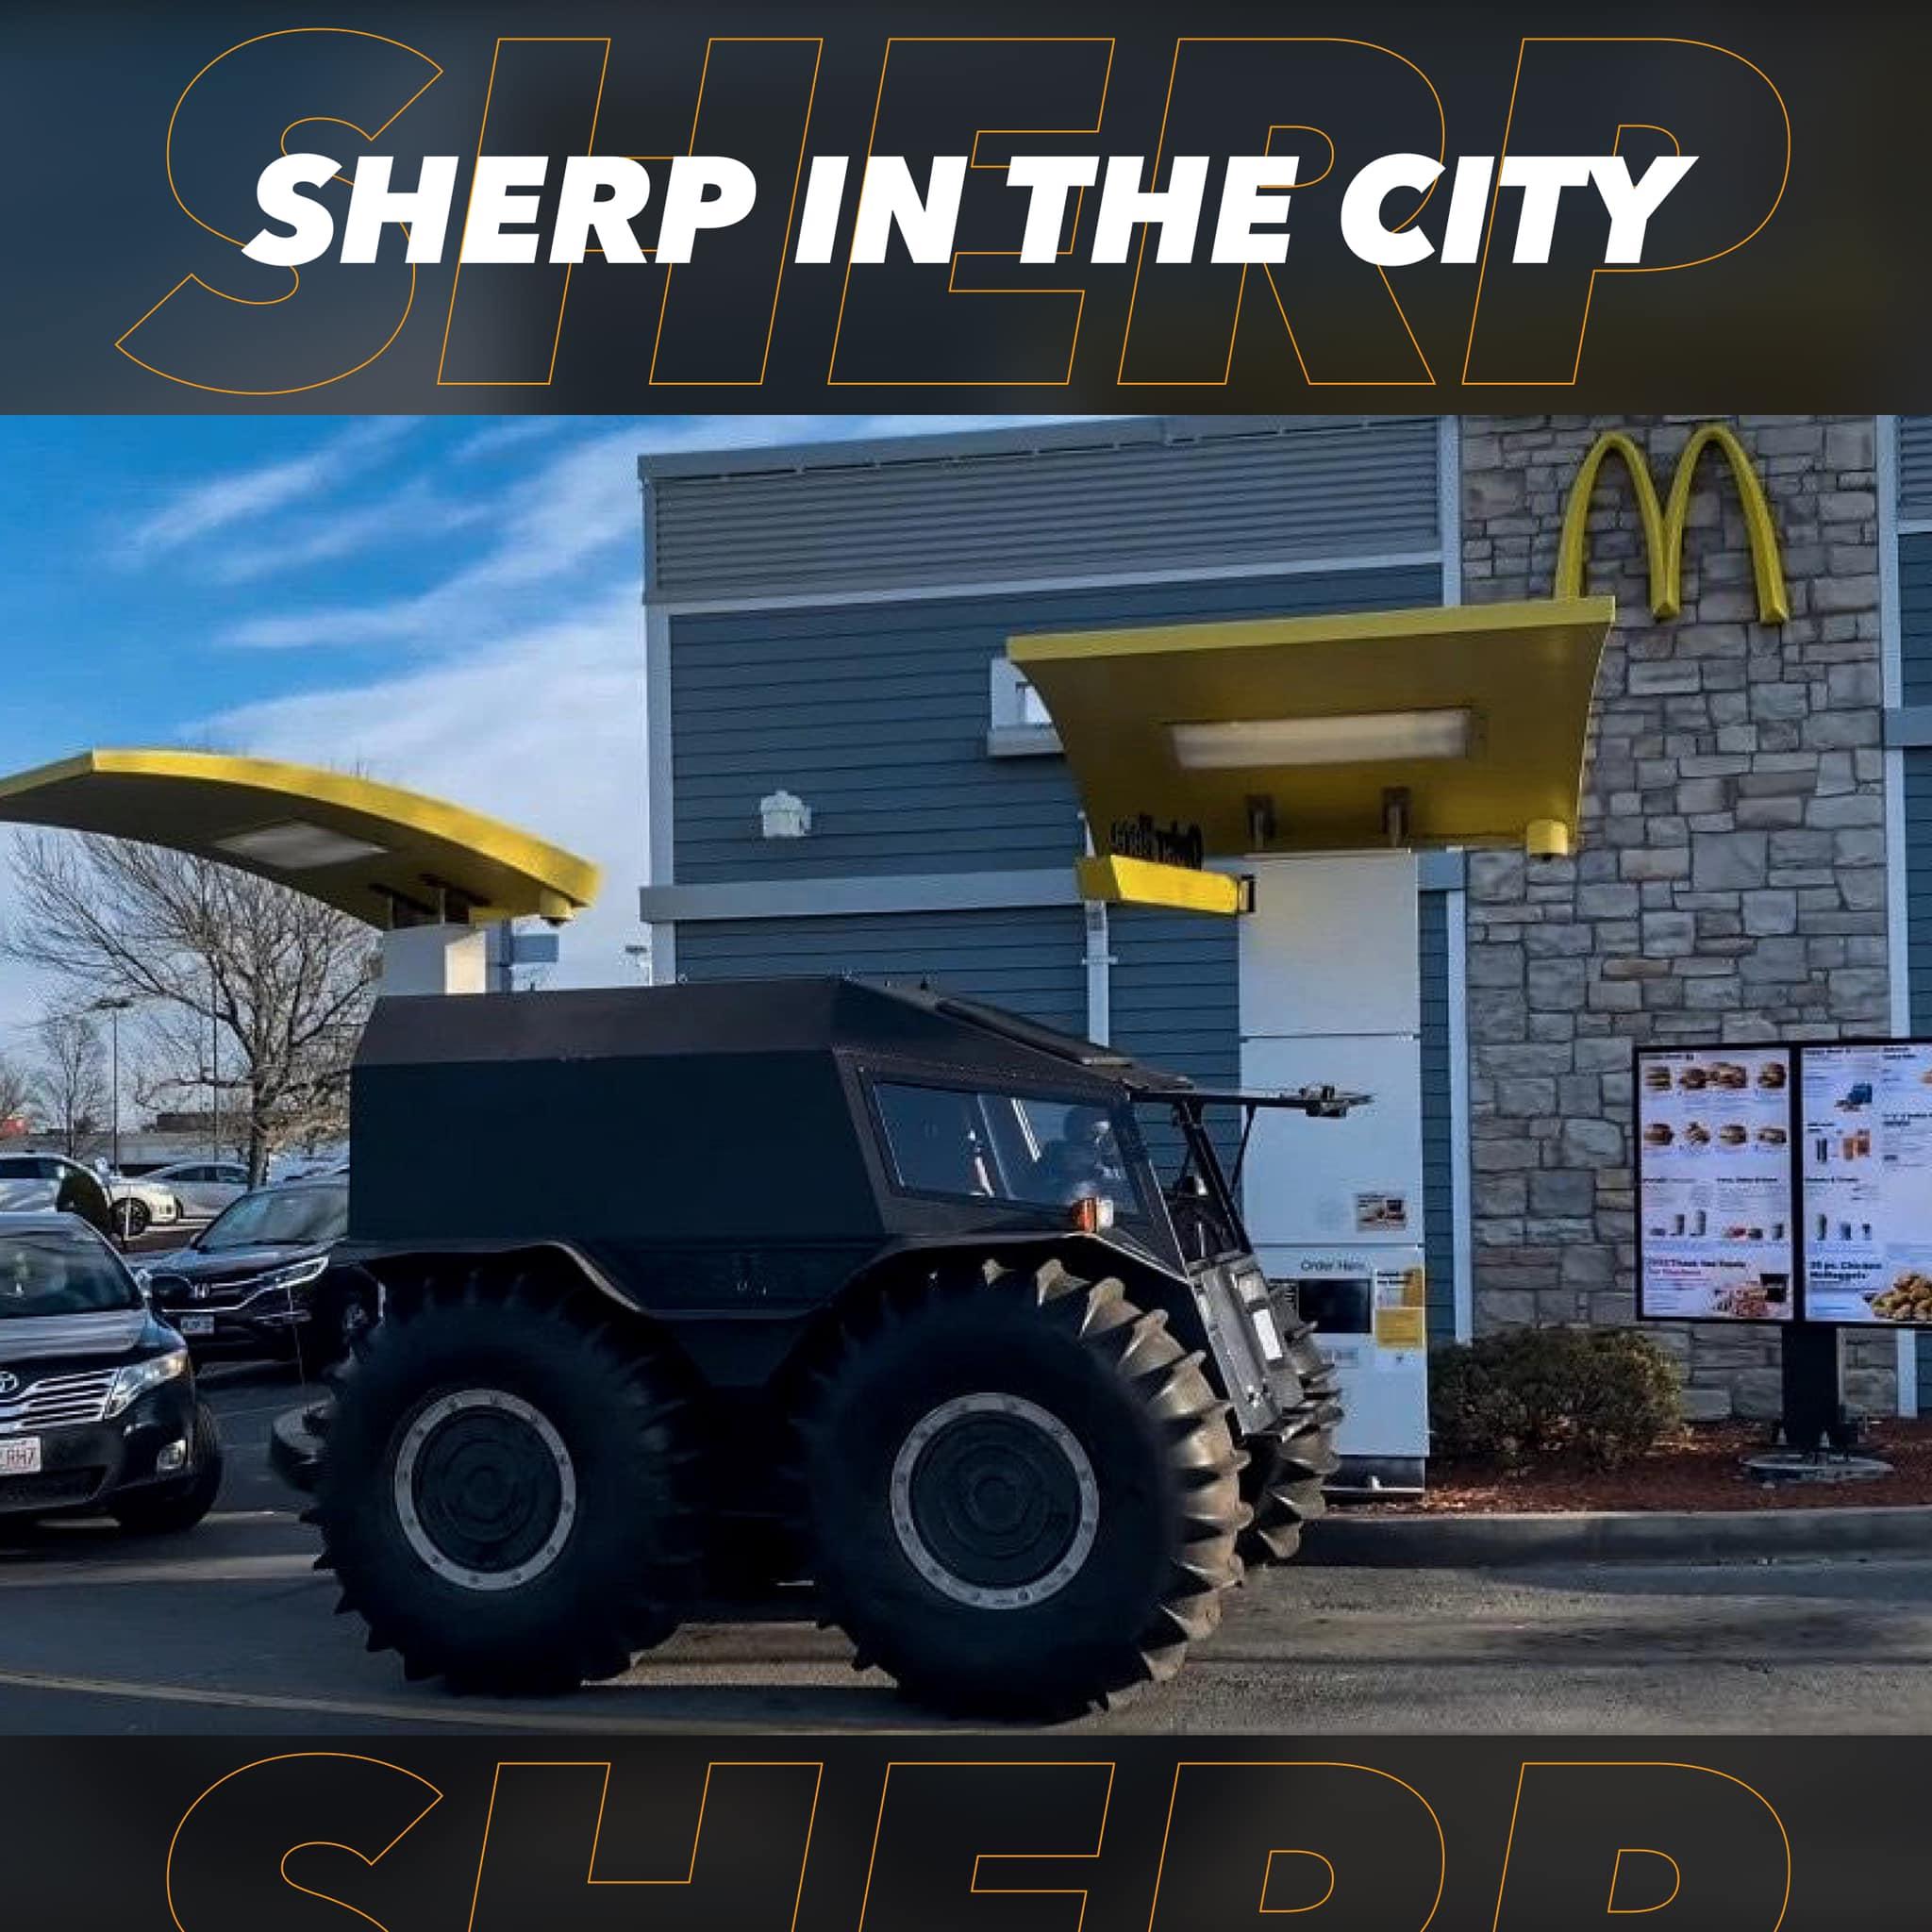 Rich Rebuilds drives SHERP to drive-thru